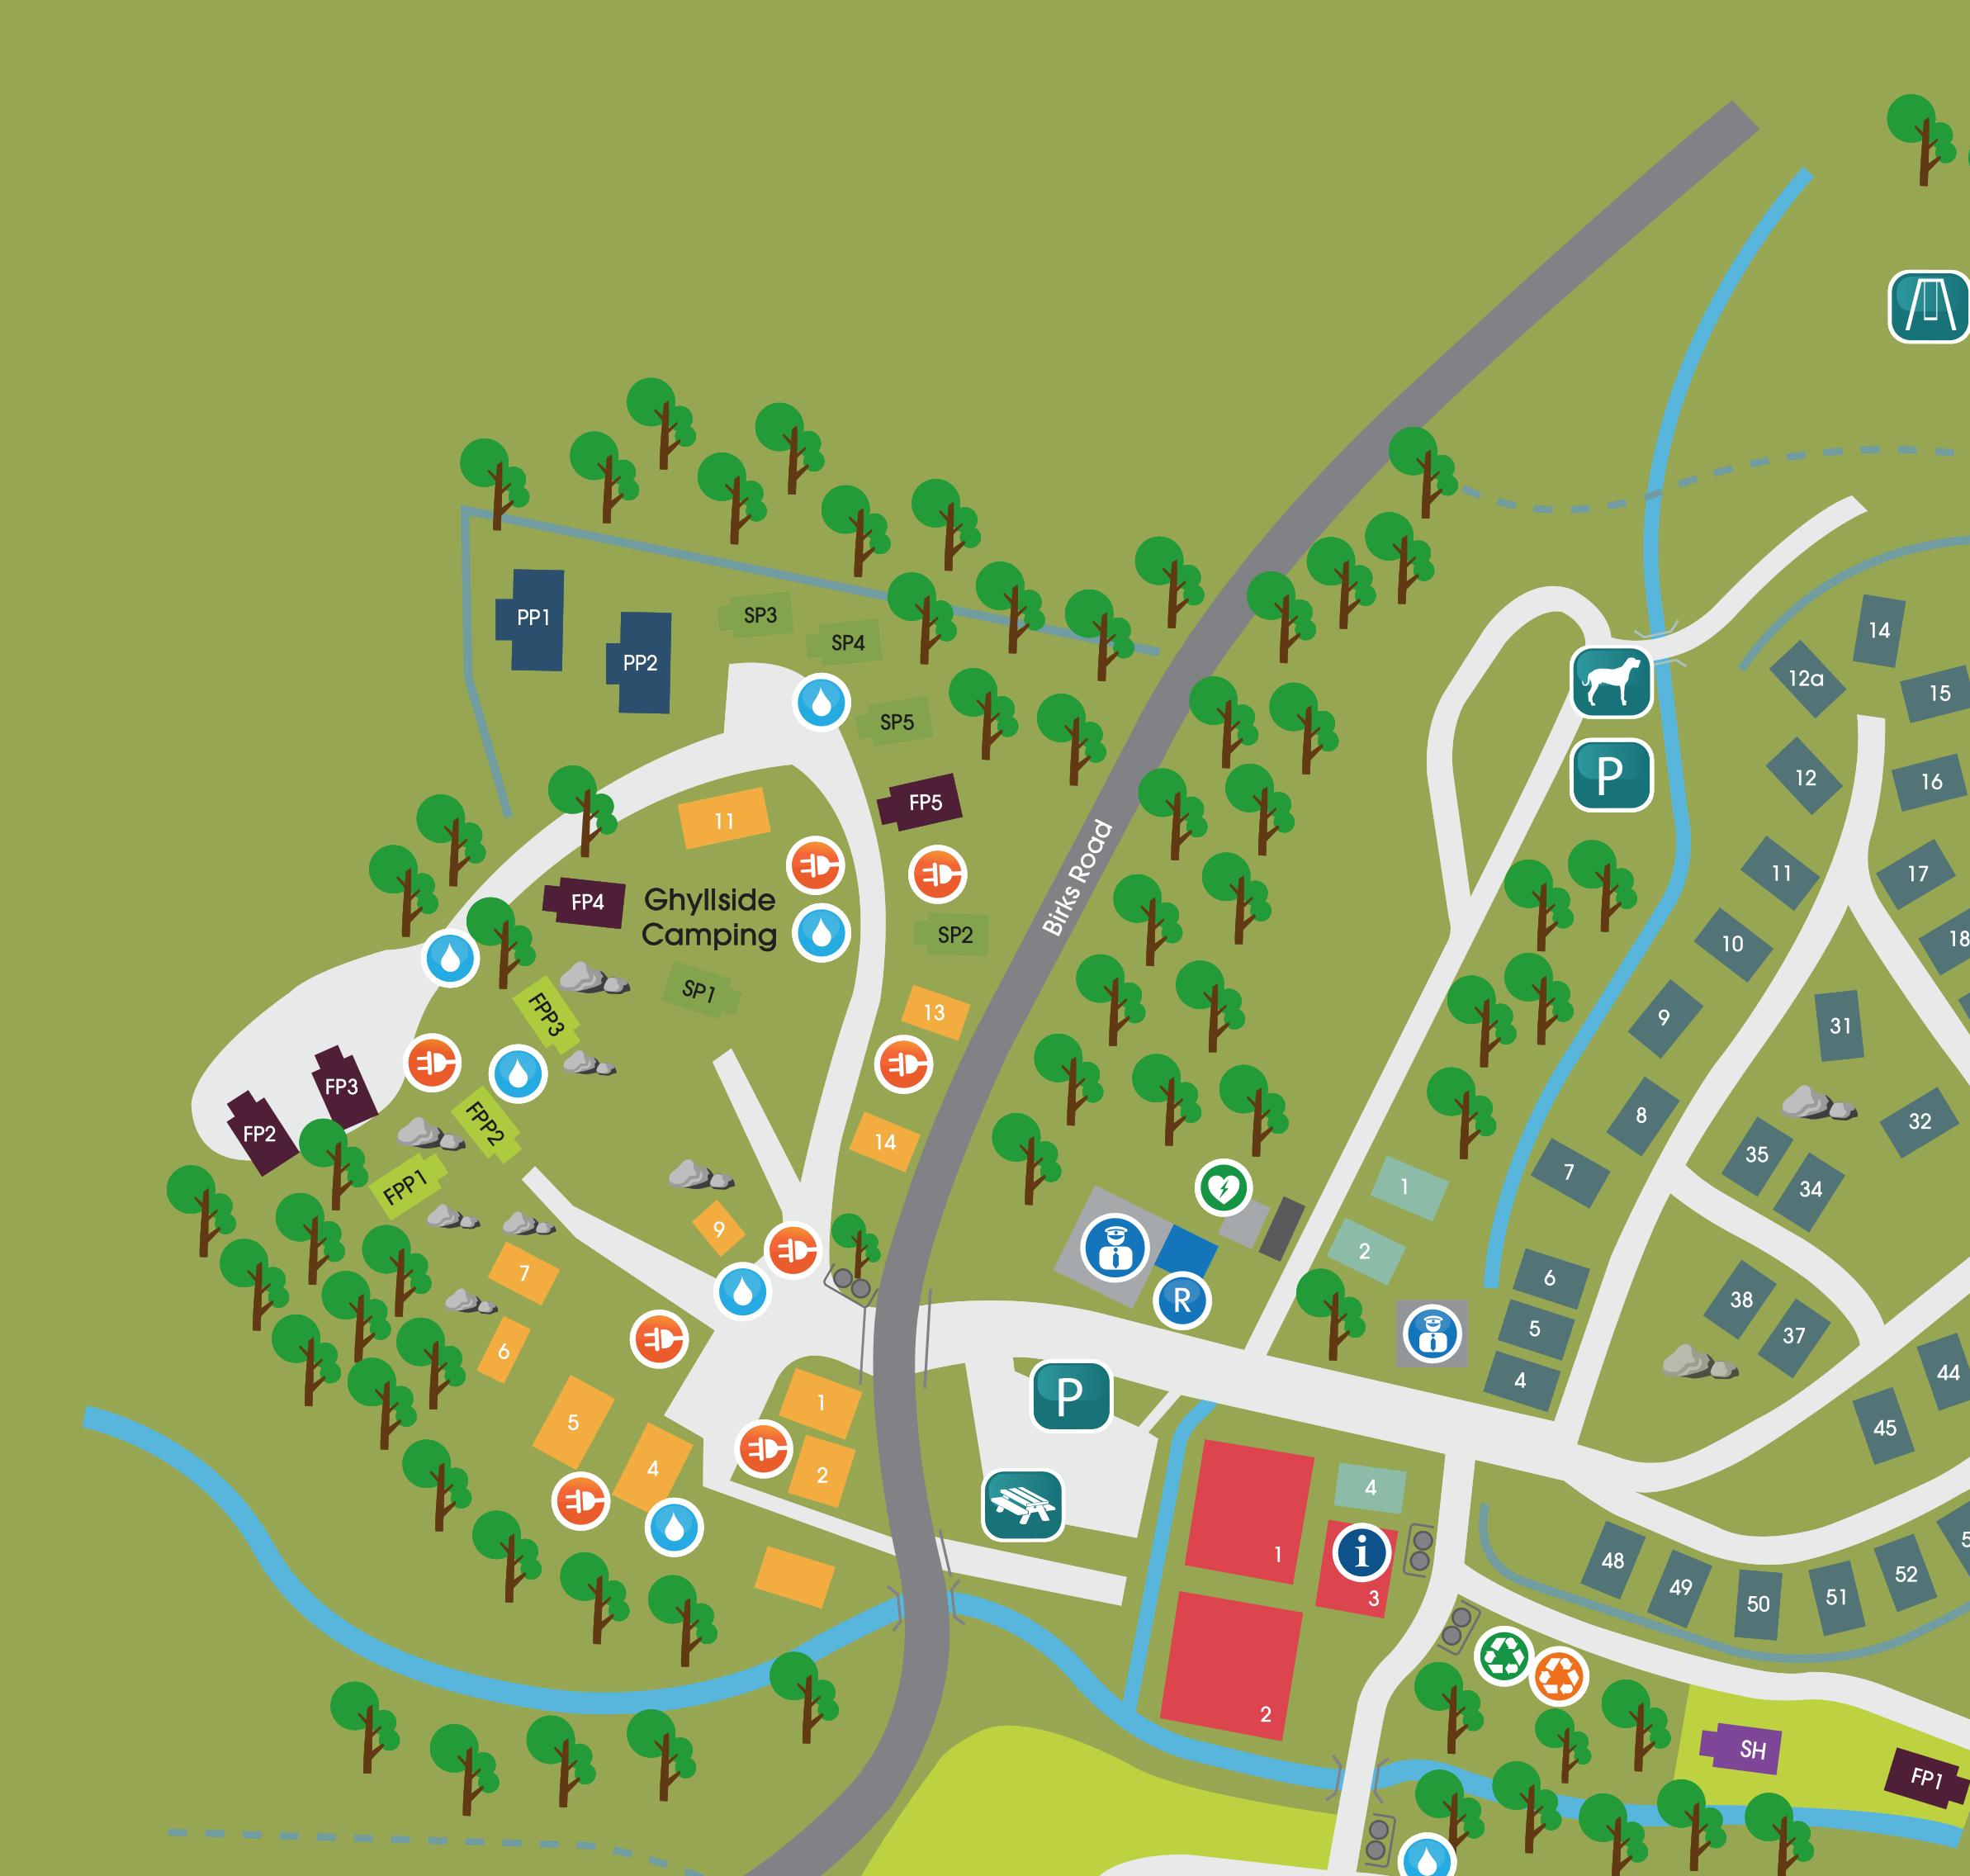 ghyllside campsite map